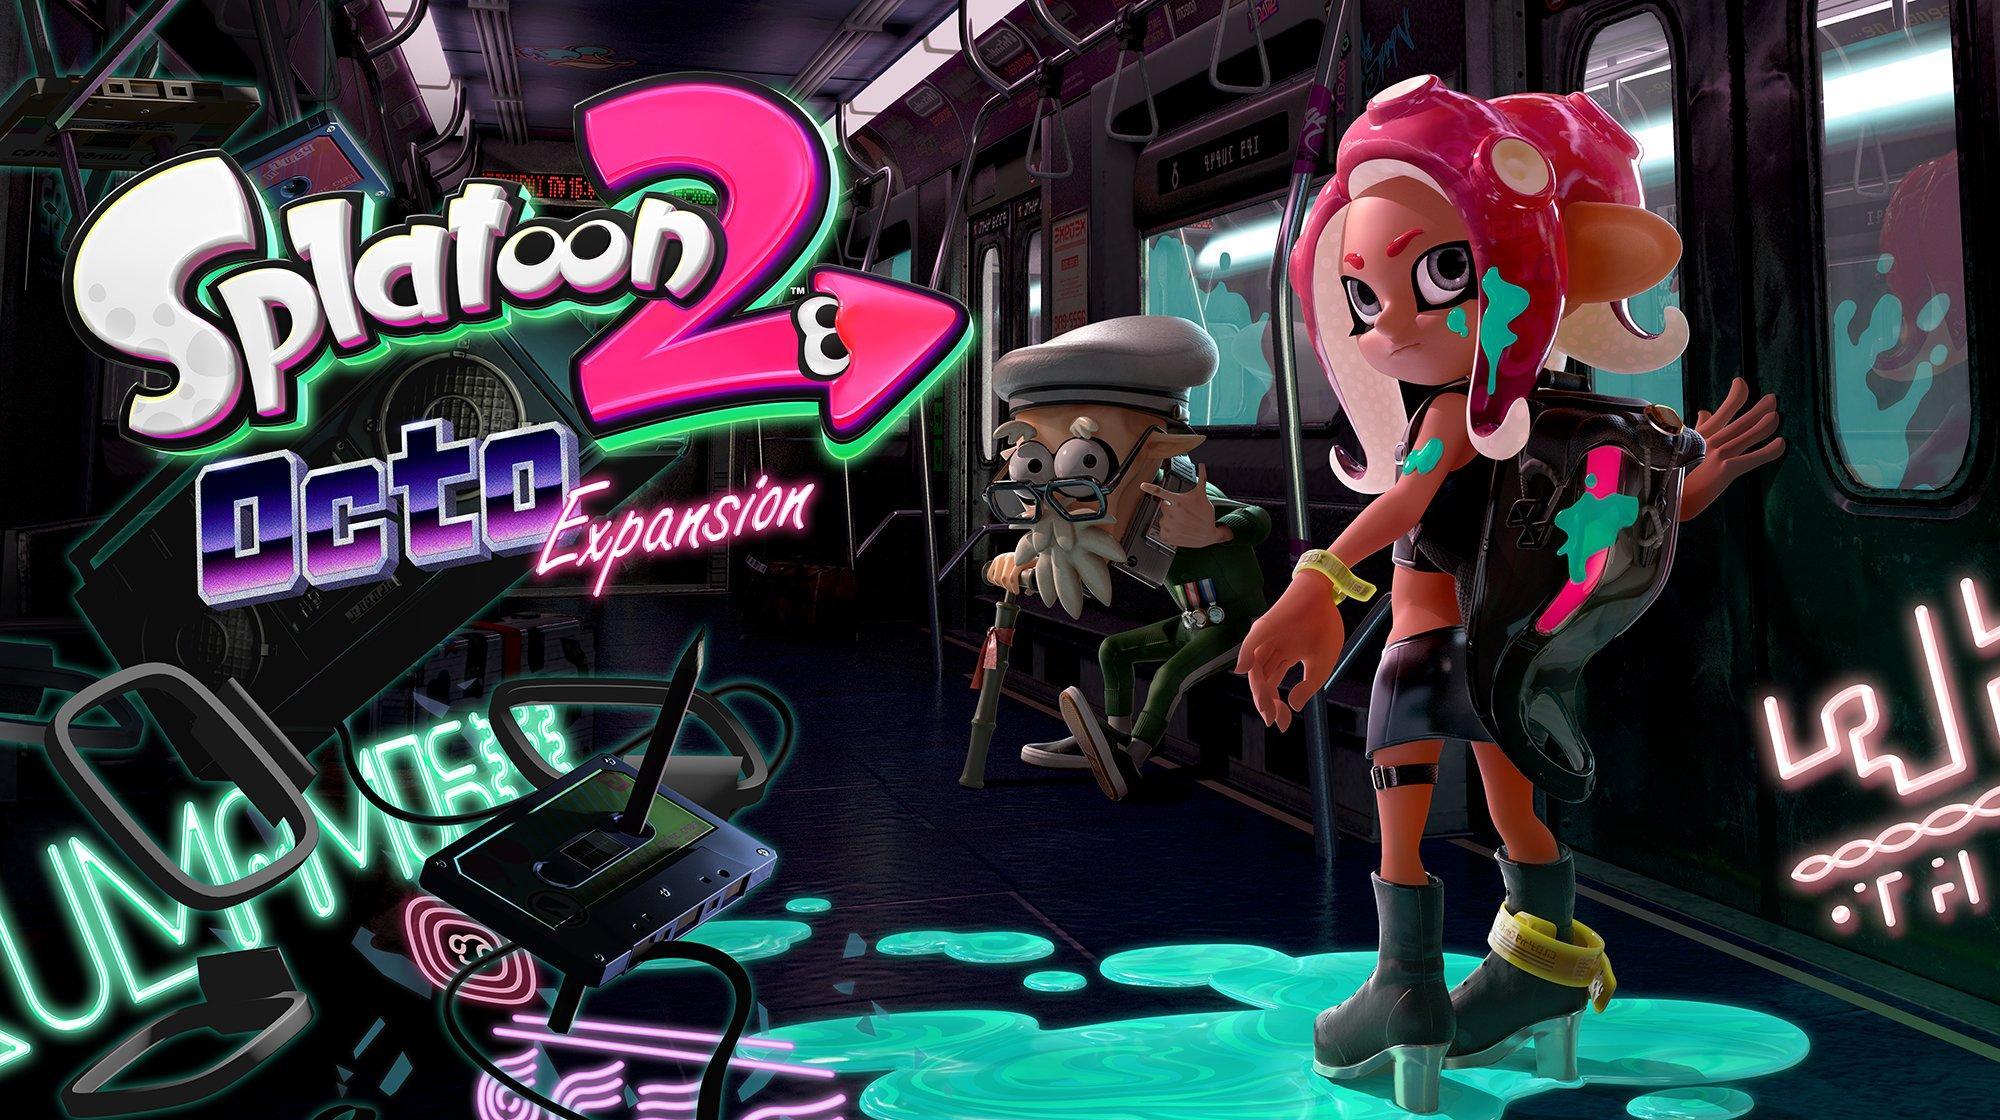 Splatoon 2 Octo Expansion Nintendo Switch Gamestop